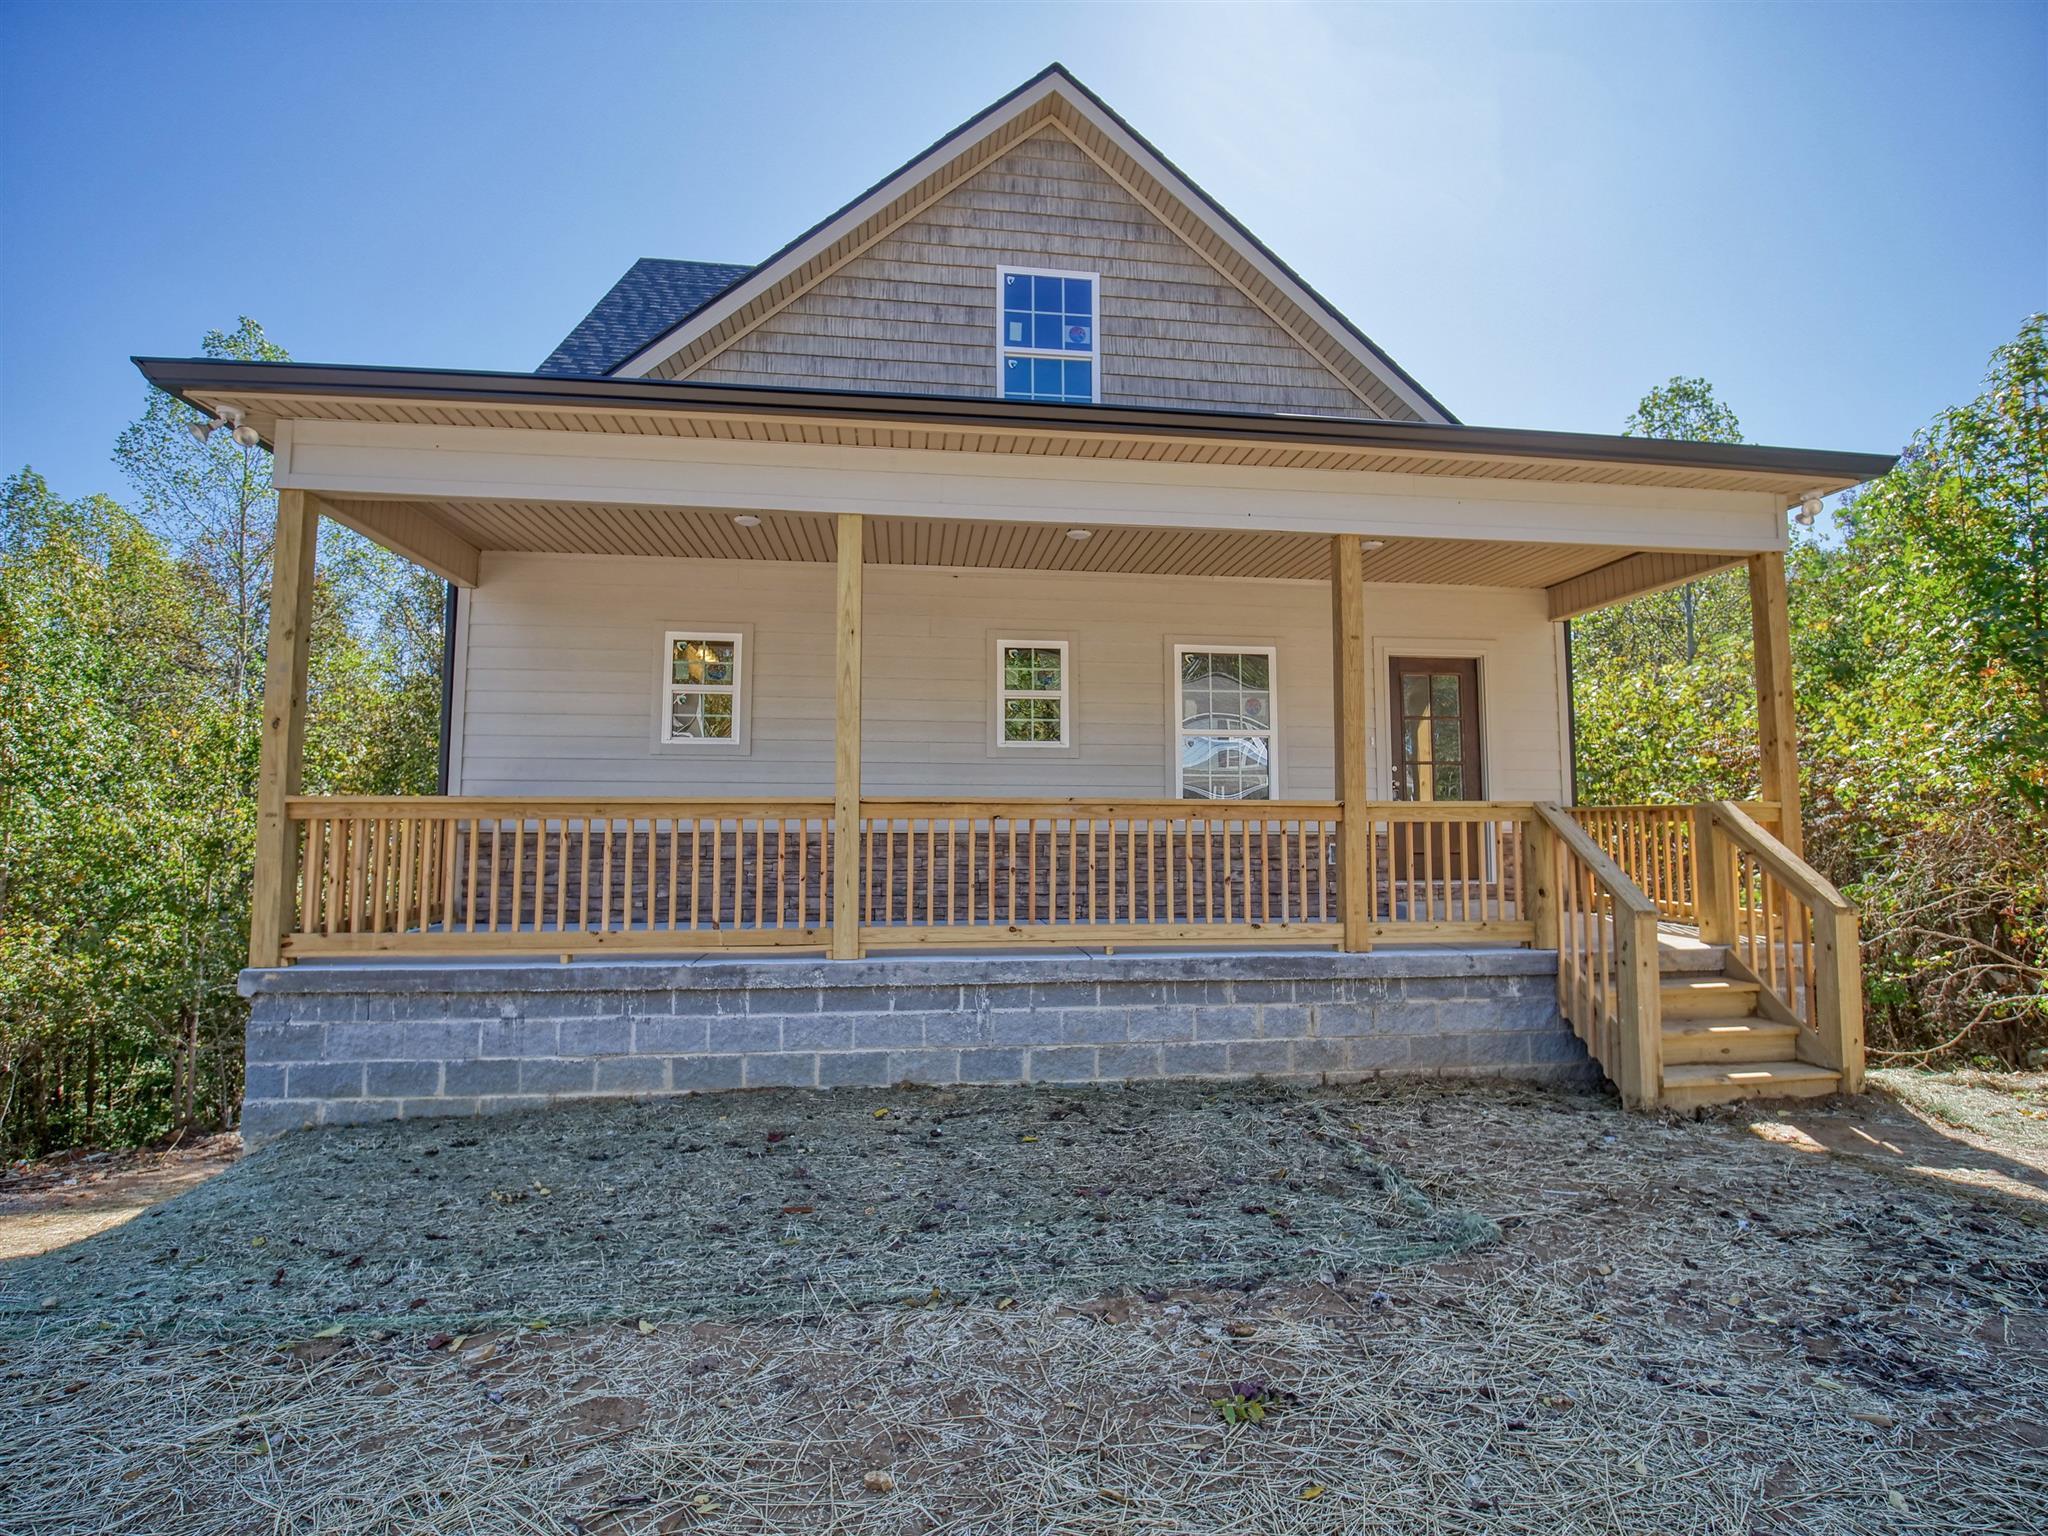 170 Shiloh Lane, Smithville, TN 37166 - Smithville, TN real estate listing